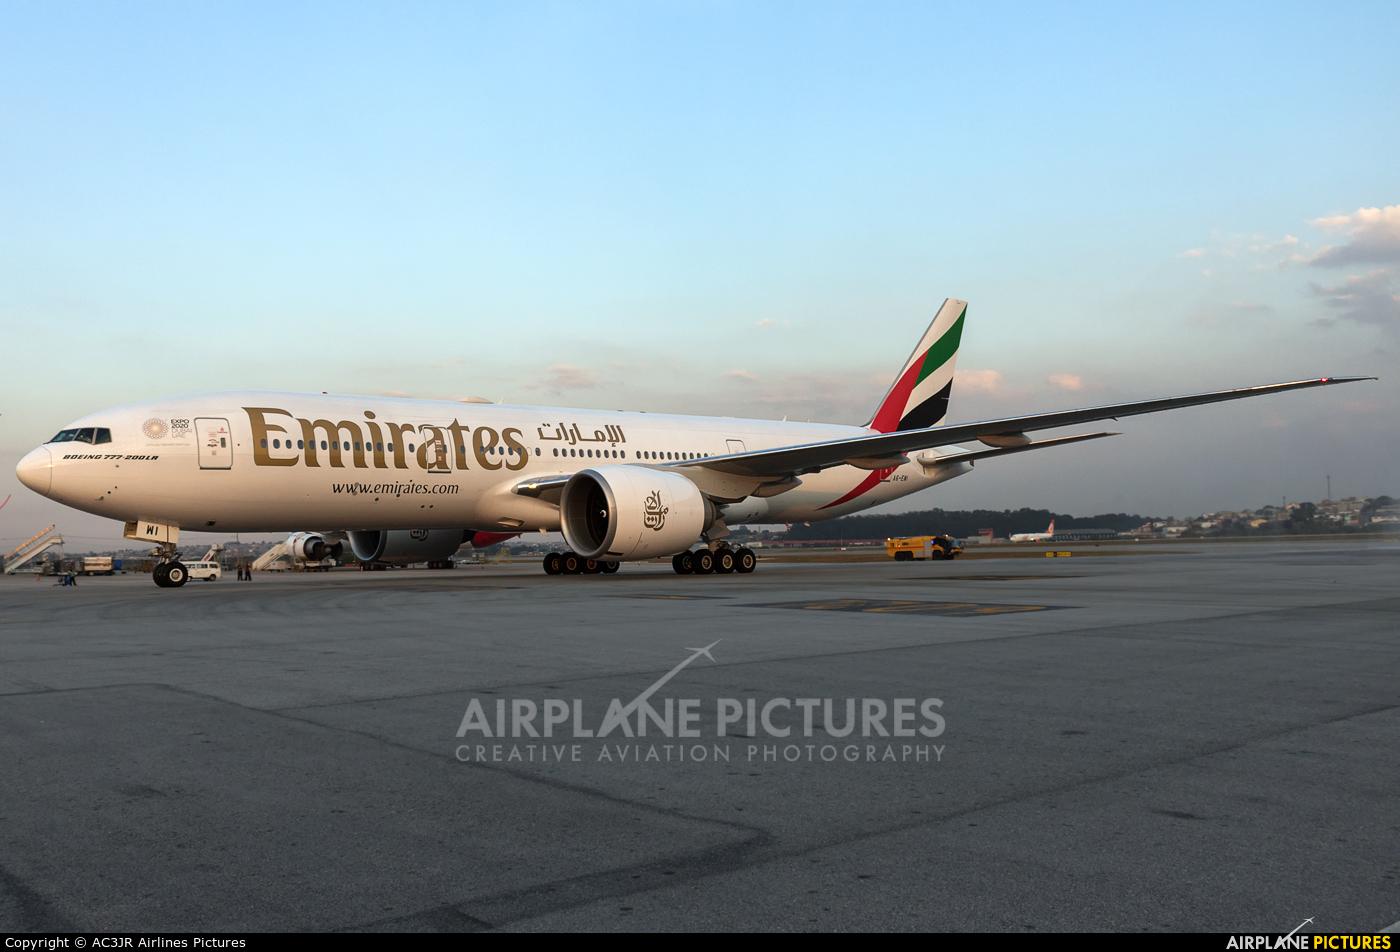 Emirates Airlines A6-EWI aircraft at São Paulo - Guarulhos